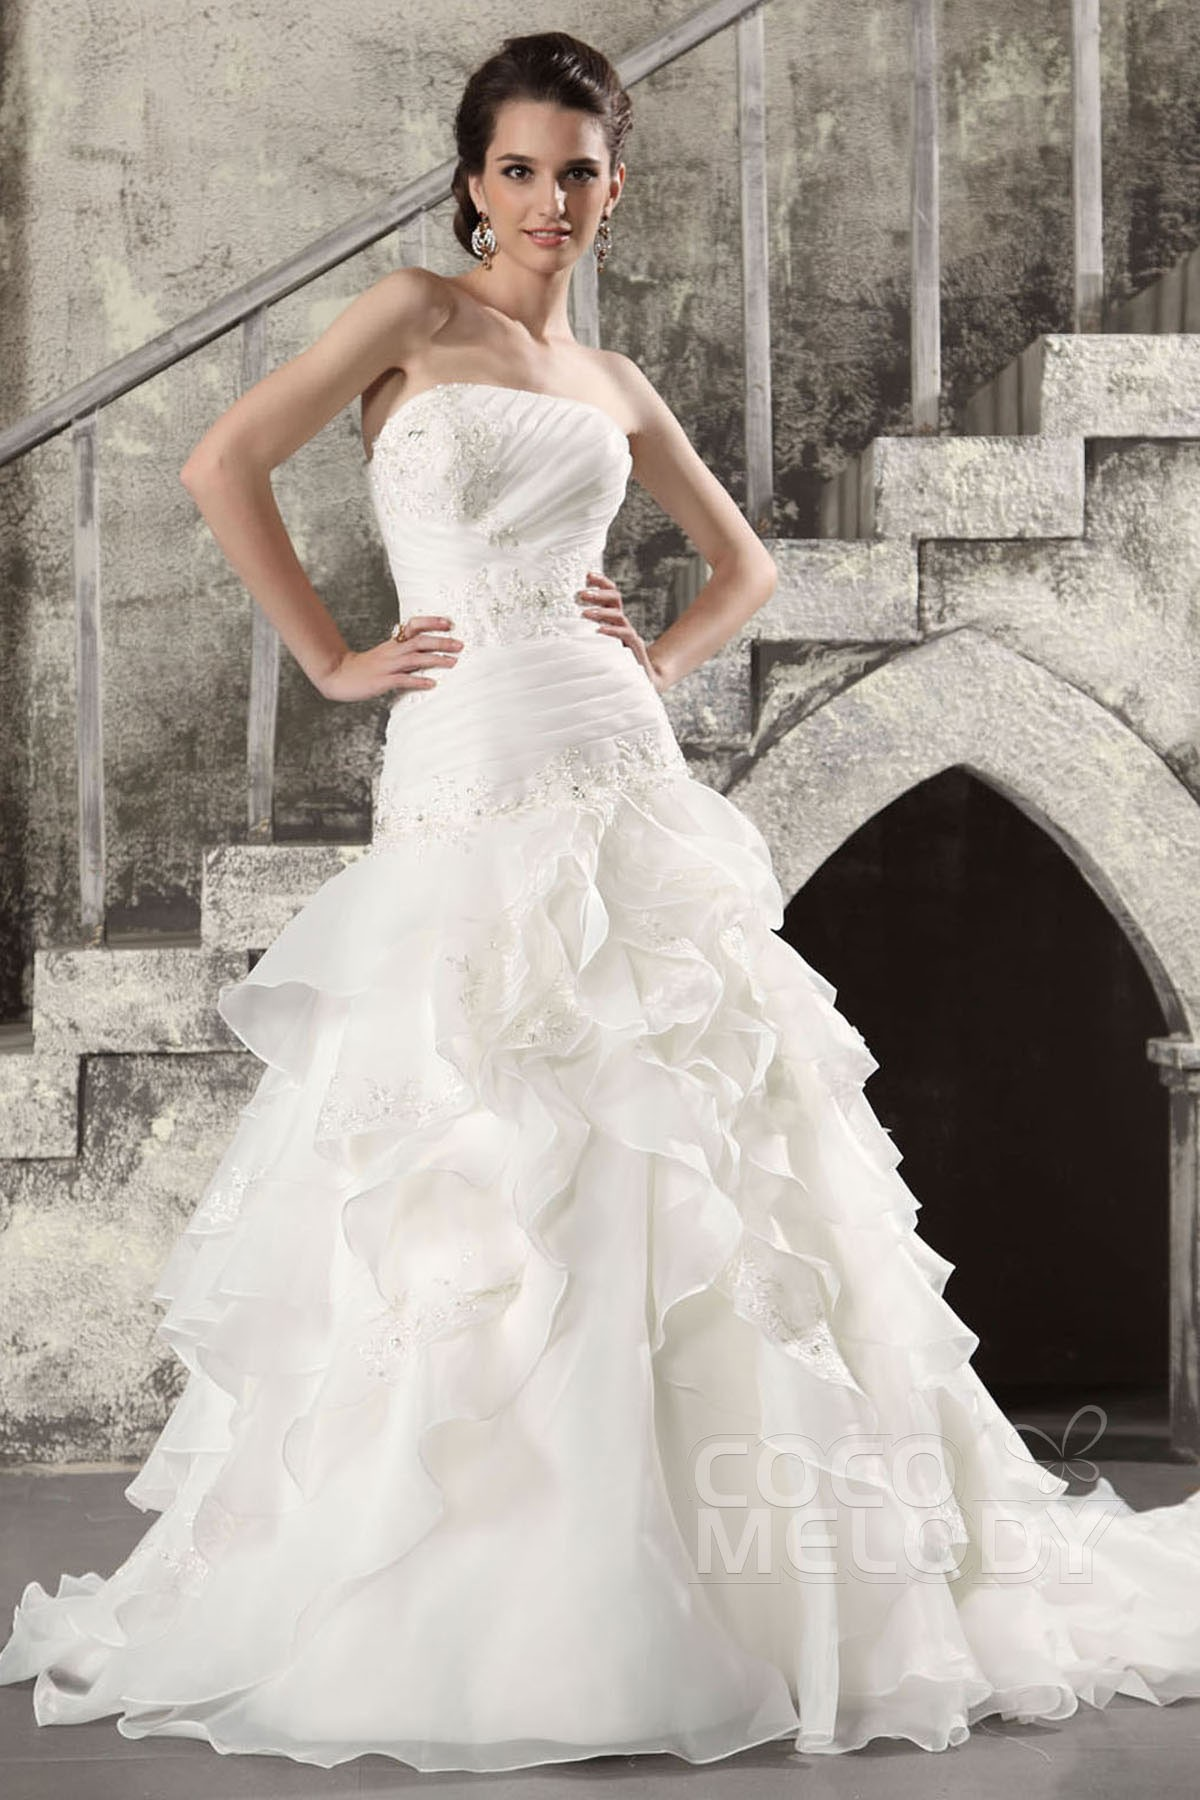 Sparkle Strapless Dropped Waist Chapel Train Organza Lace Up Corset Wedding Dress Cwlt13024